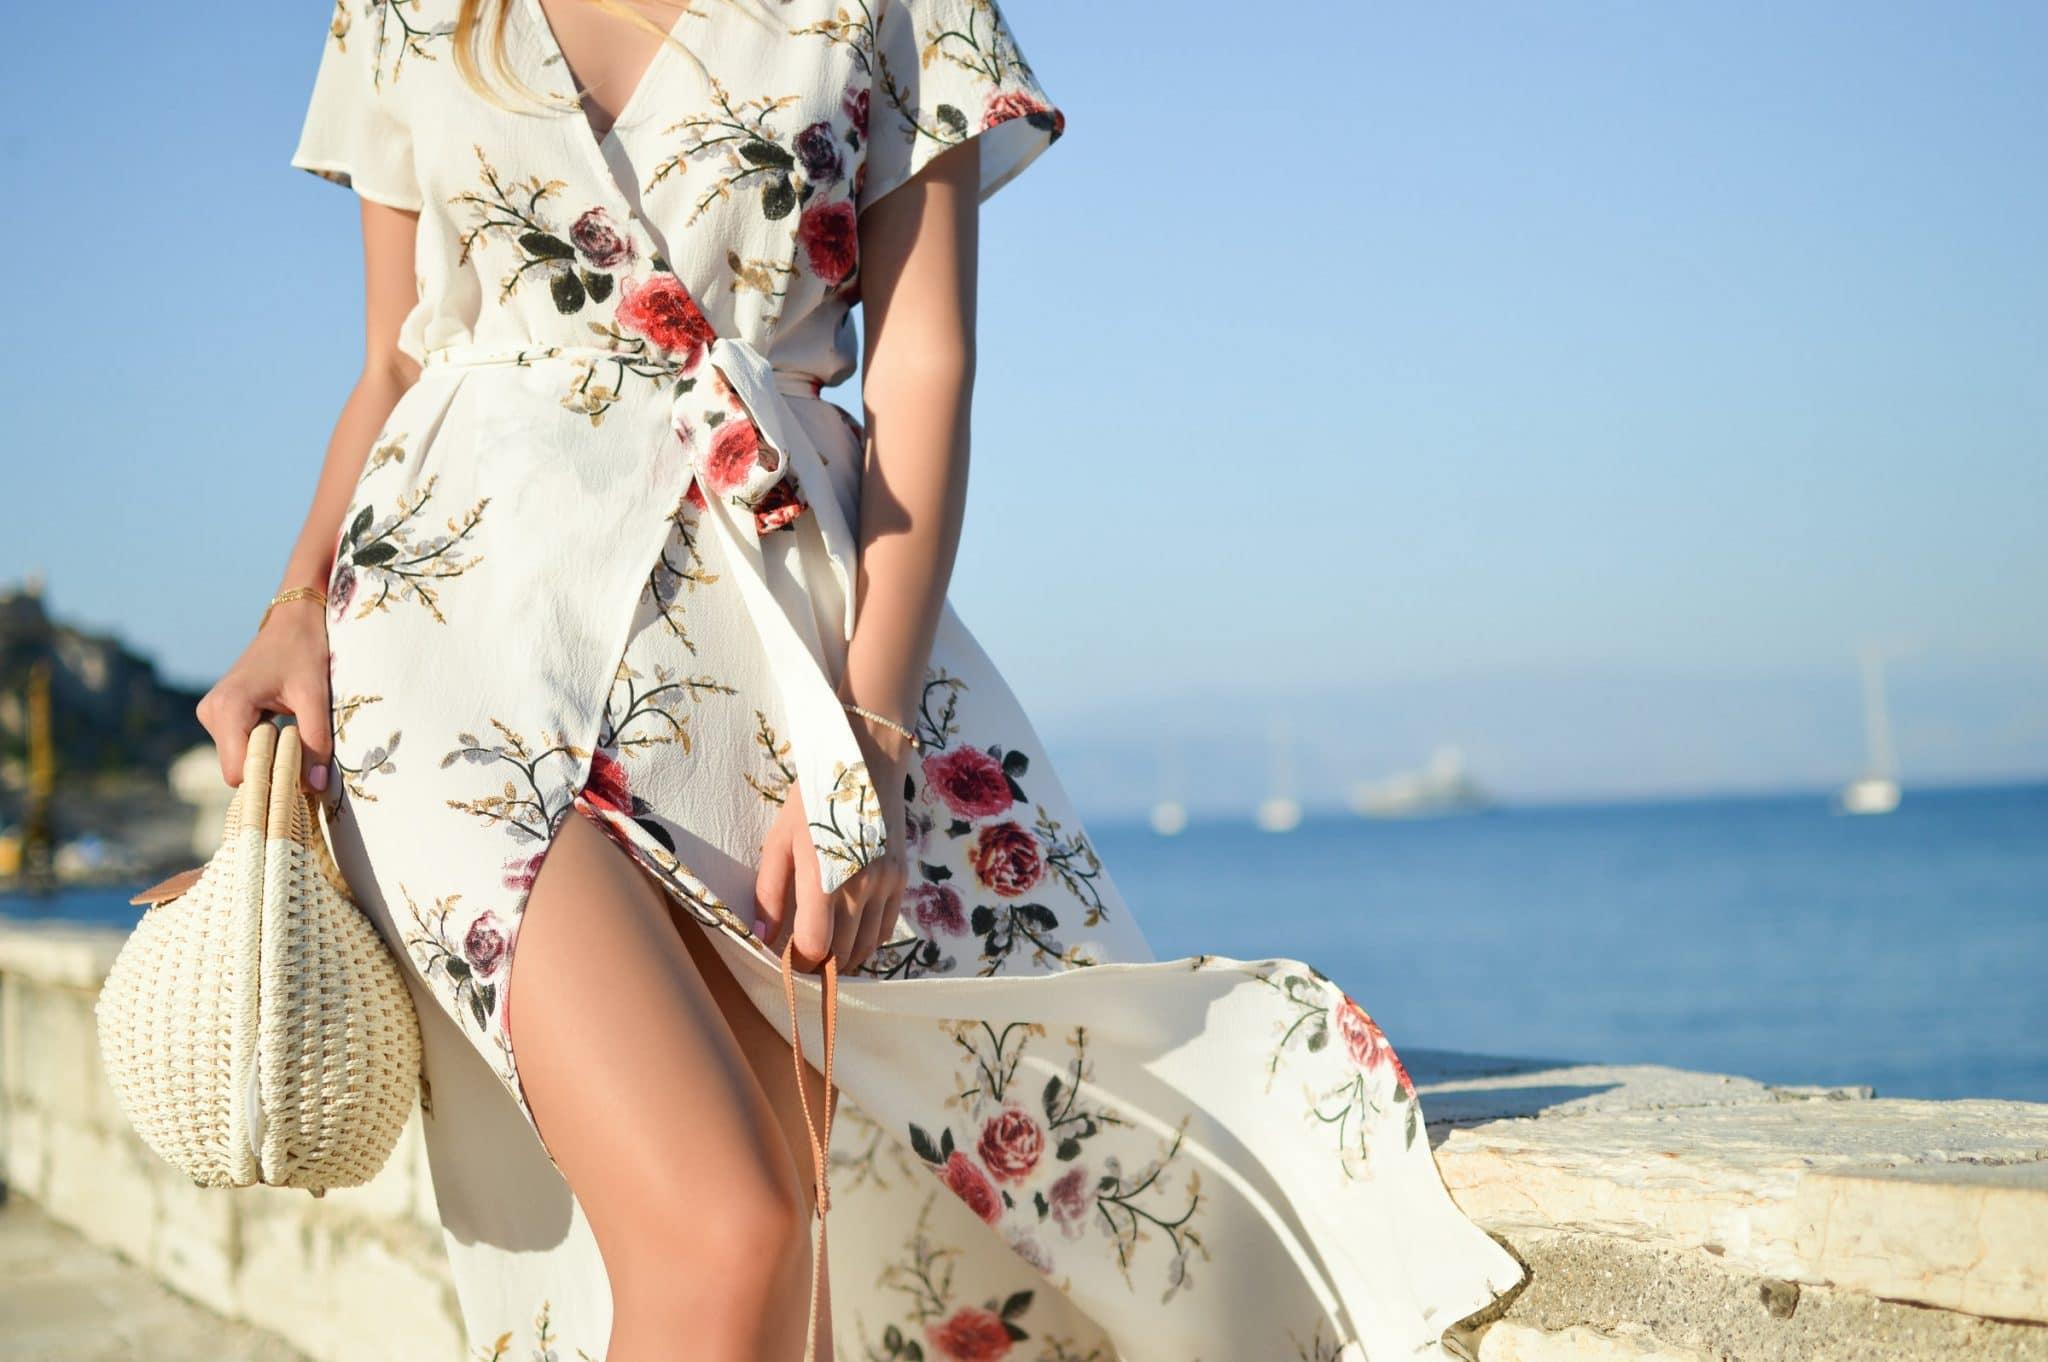 Shaniba Creative Industry - Membuat Foto Pakaian yang Bagus